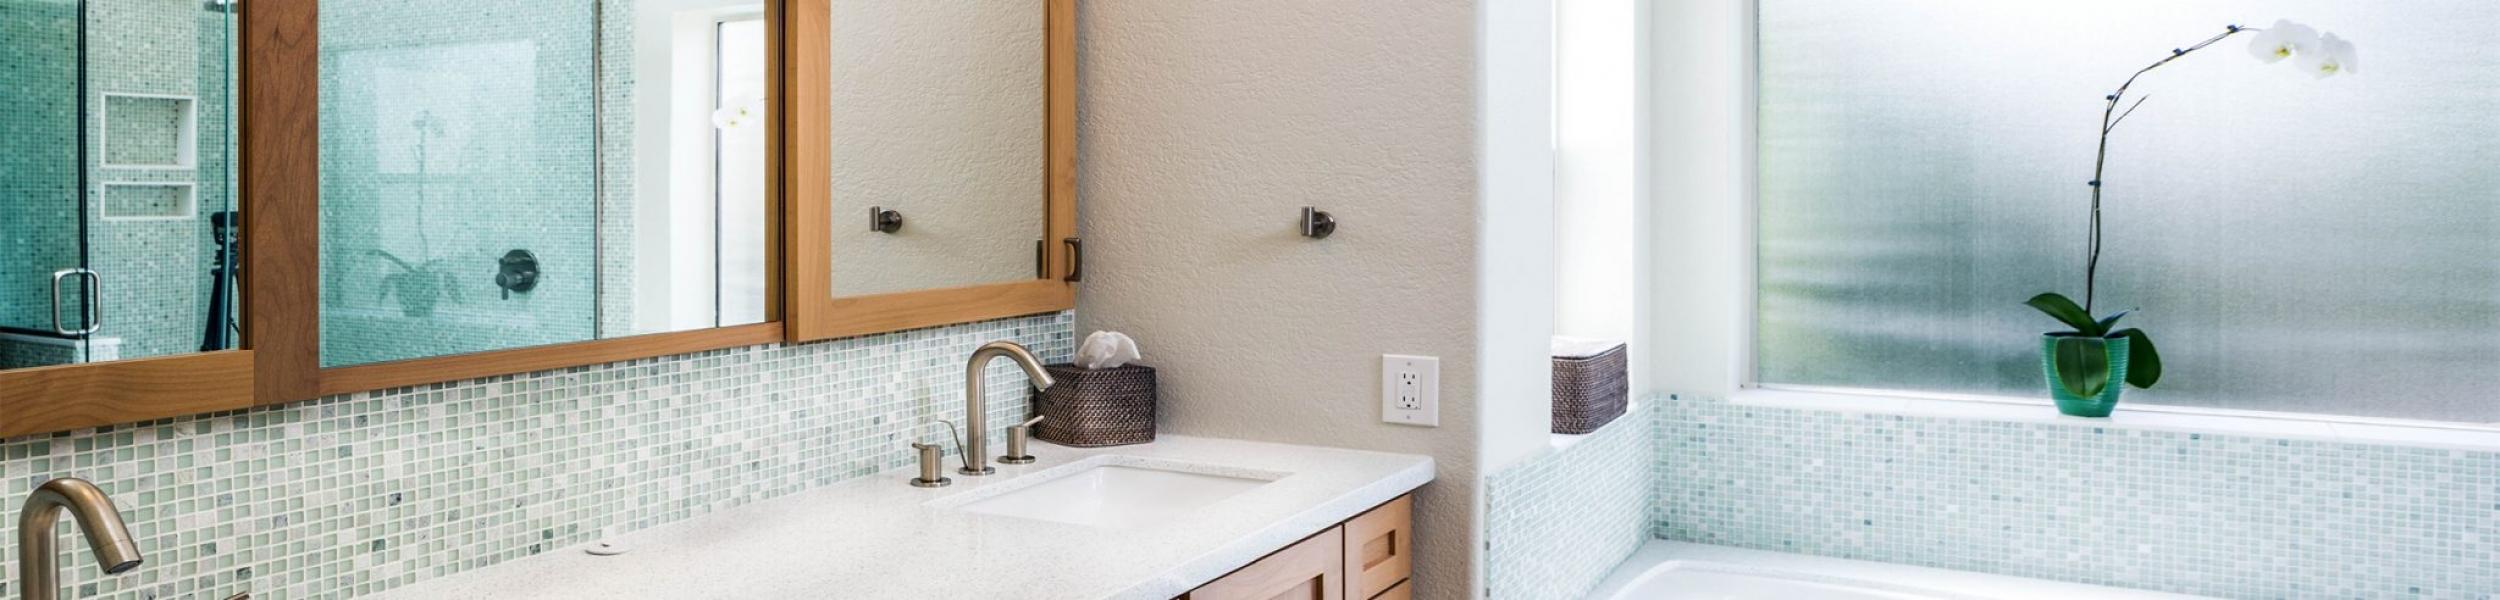 Spa Retreat Master Bathroom Remodel Studio Em Interiors - Interior Design Phoenix - Interior Design Tempe - Interior Design Chandler